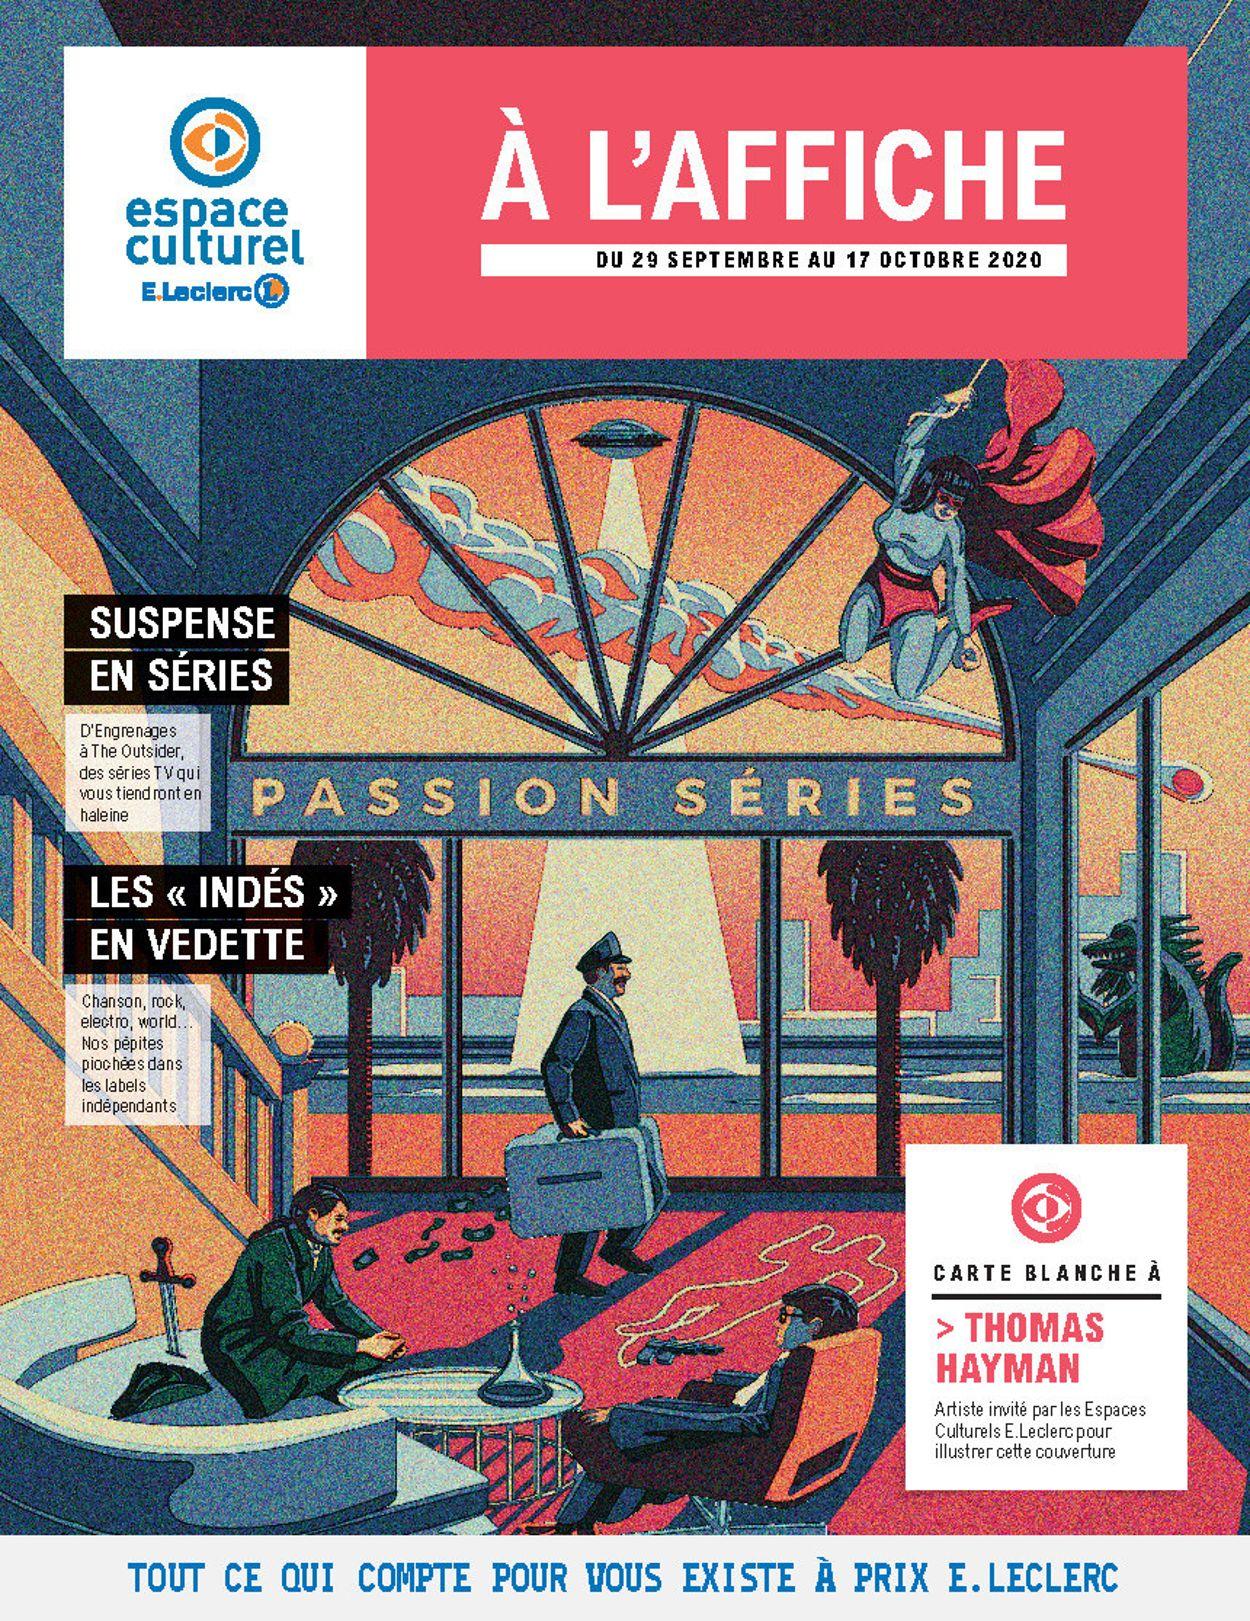 E.leclerc Catalogue - 29.09-17.10.2020